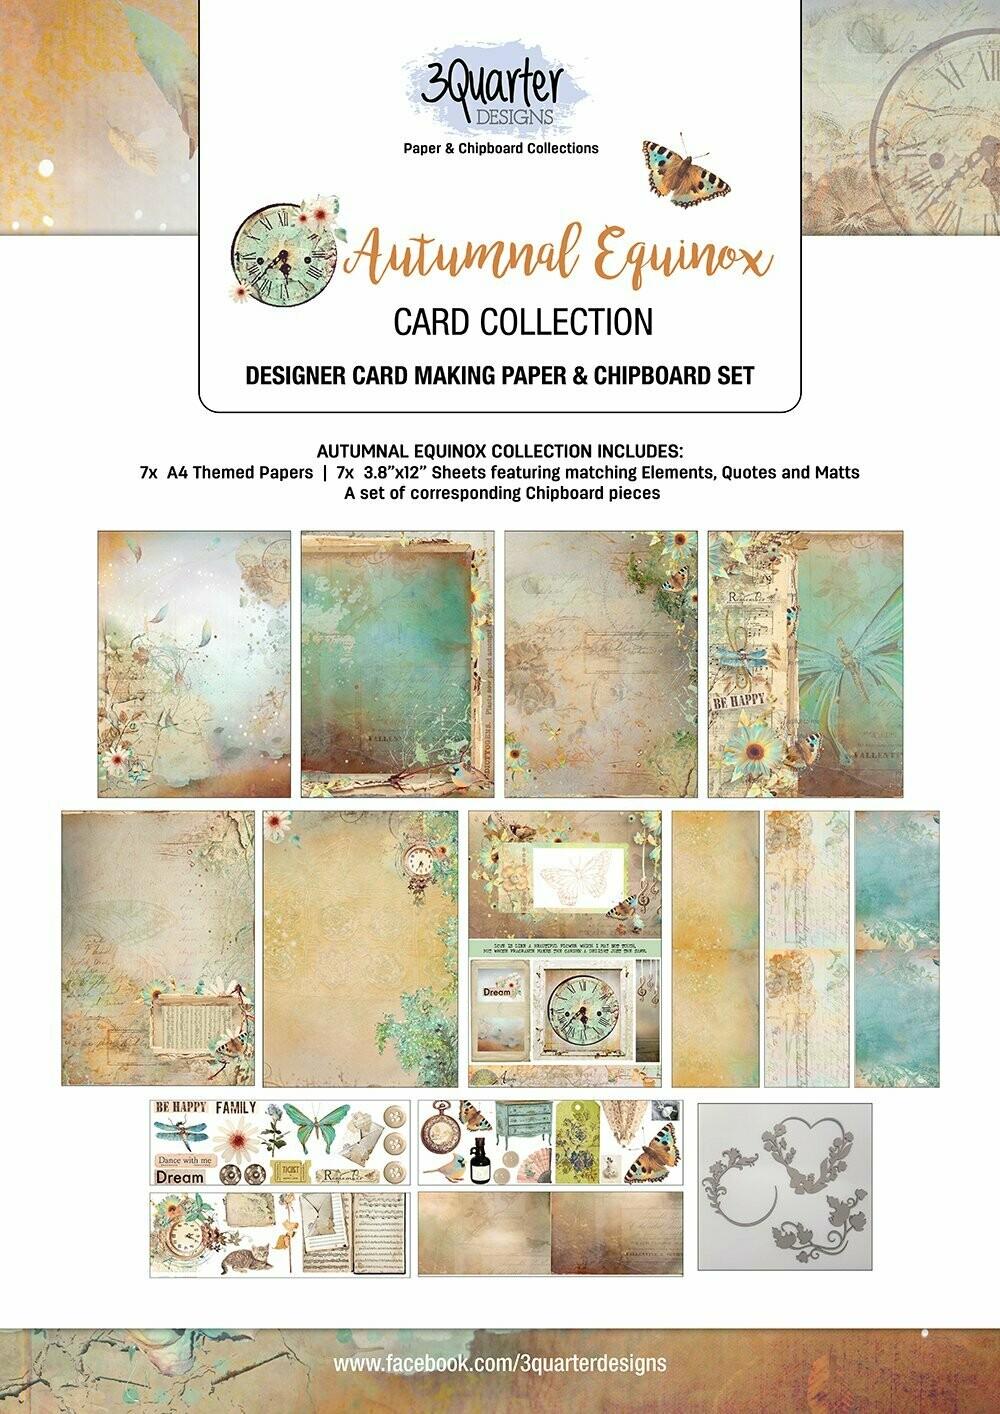 3 Quarter Designs - Card Making Kit - Autumnal Equinox